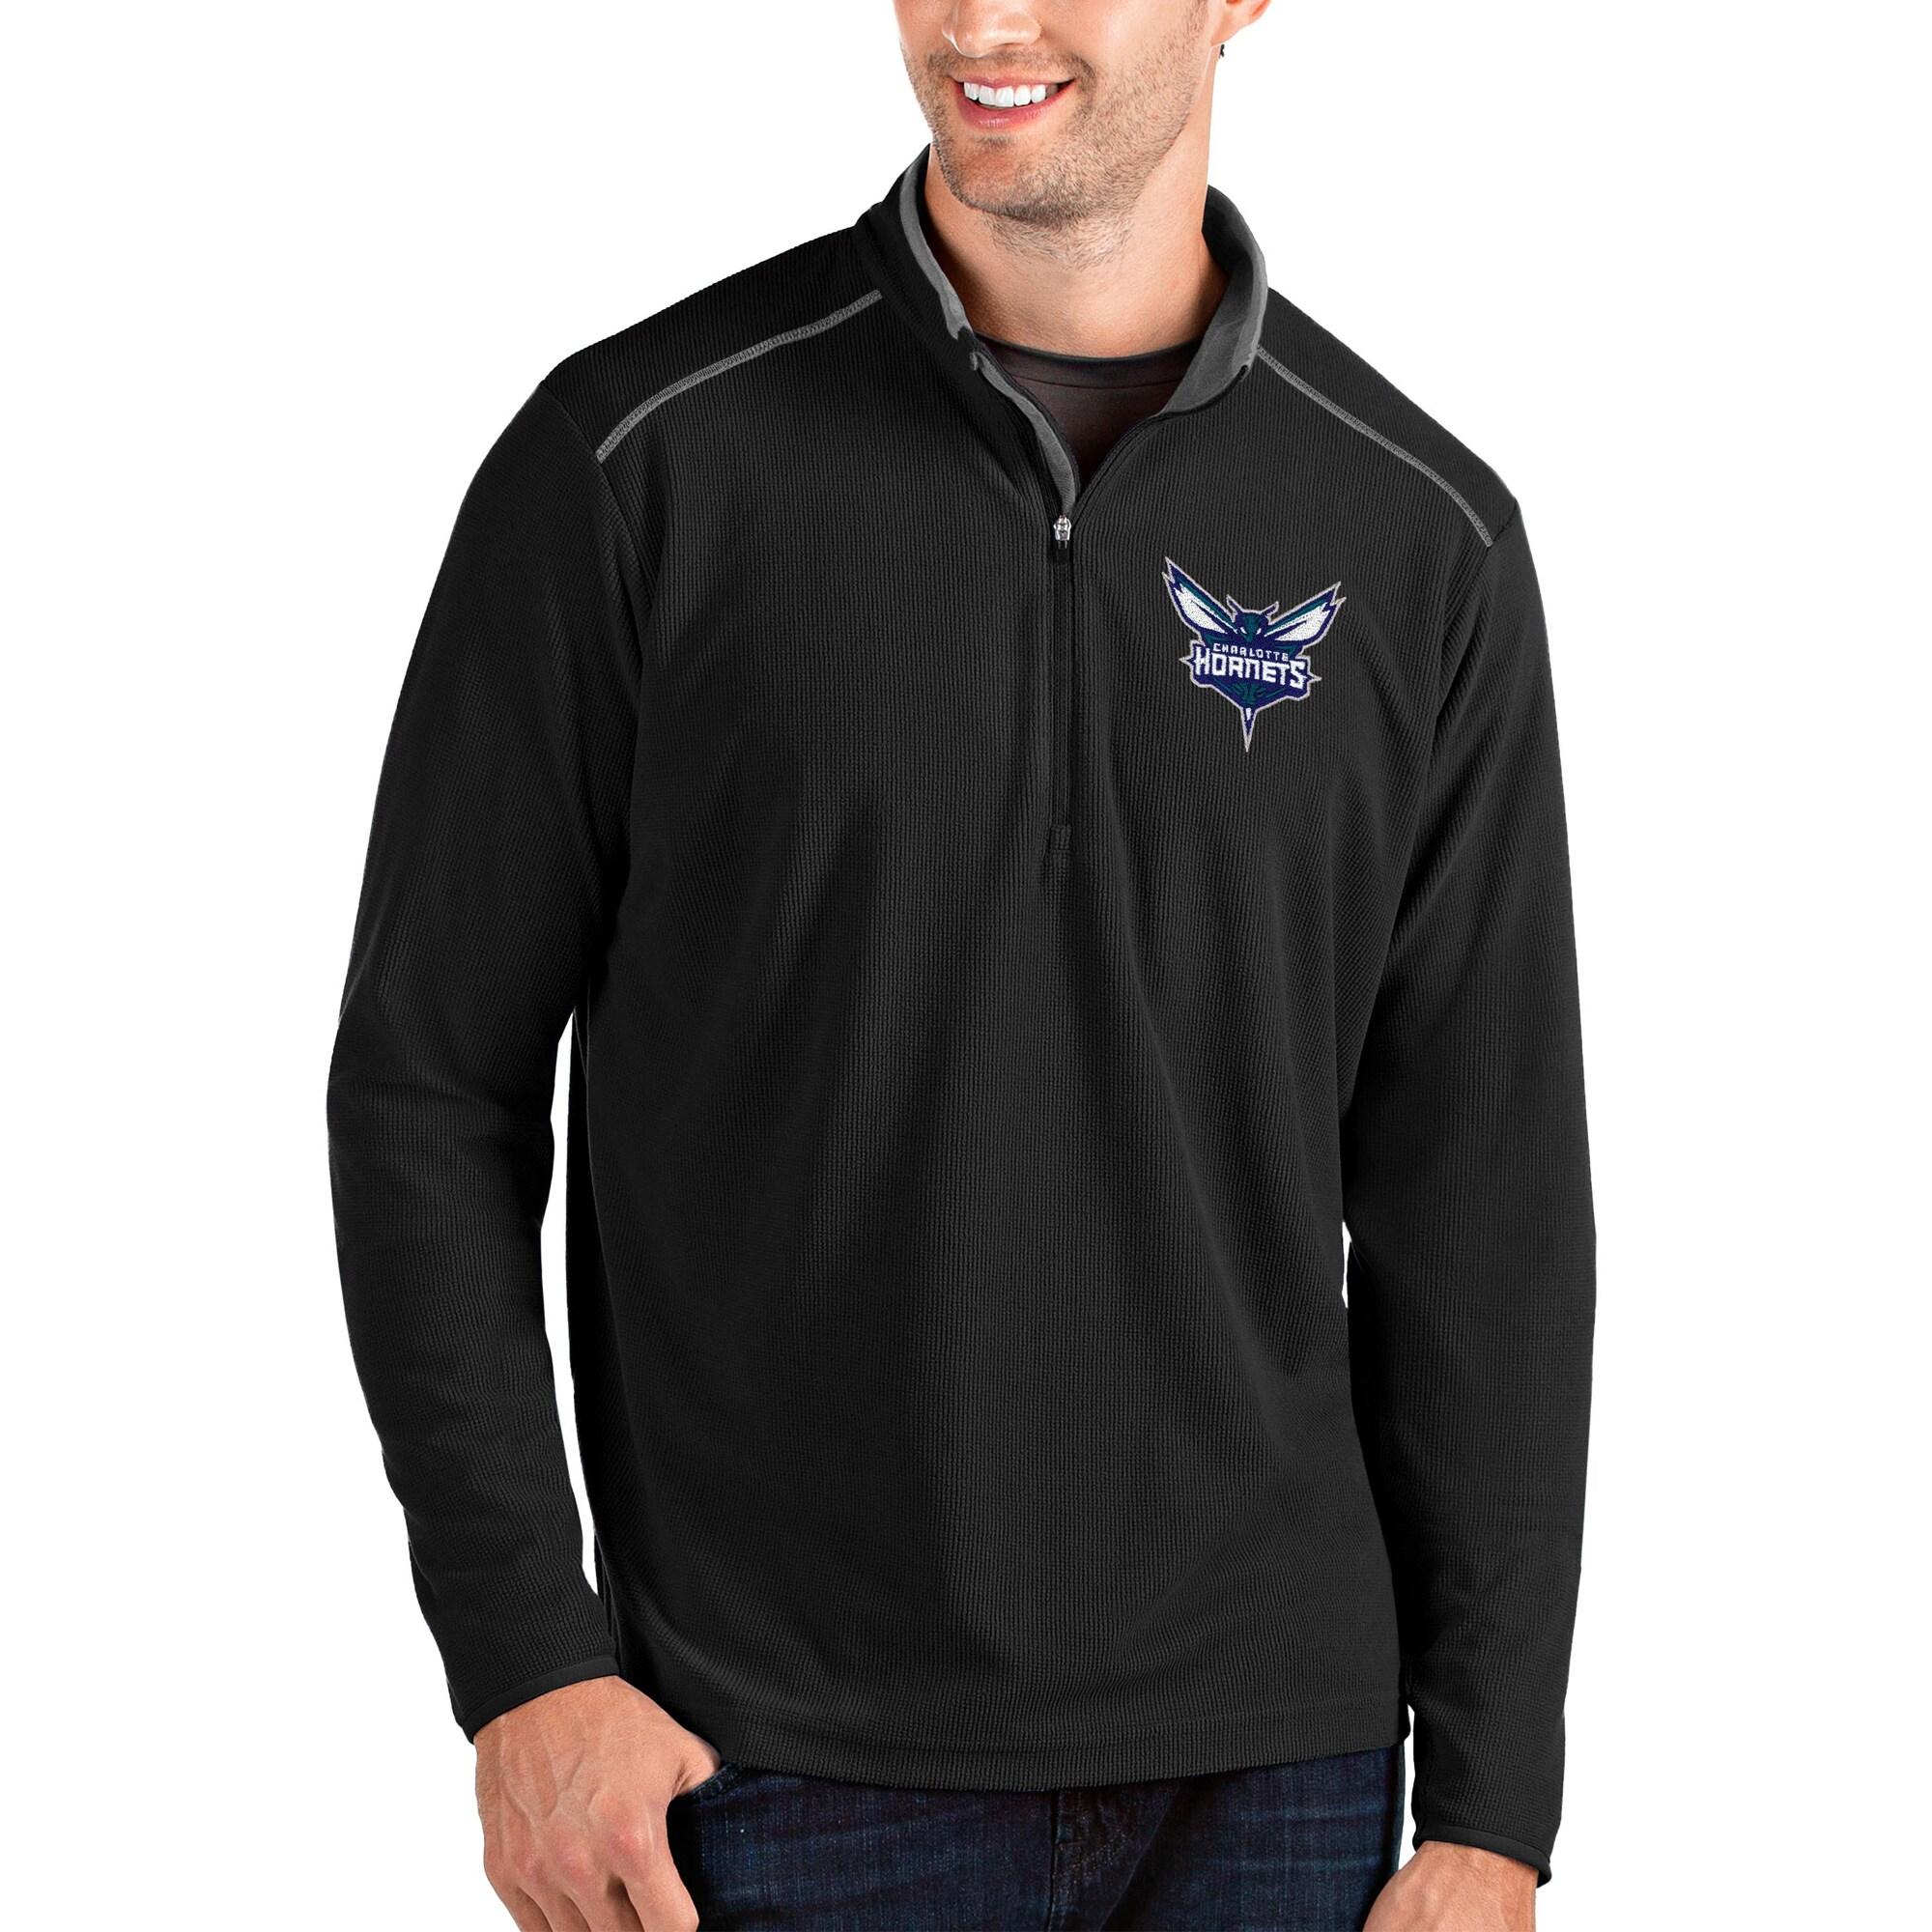 Charlotte Hornets Antigua Glacier Quarter-Zip Pullover Jacket - Black/Gray